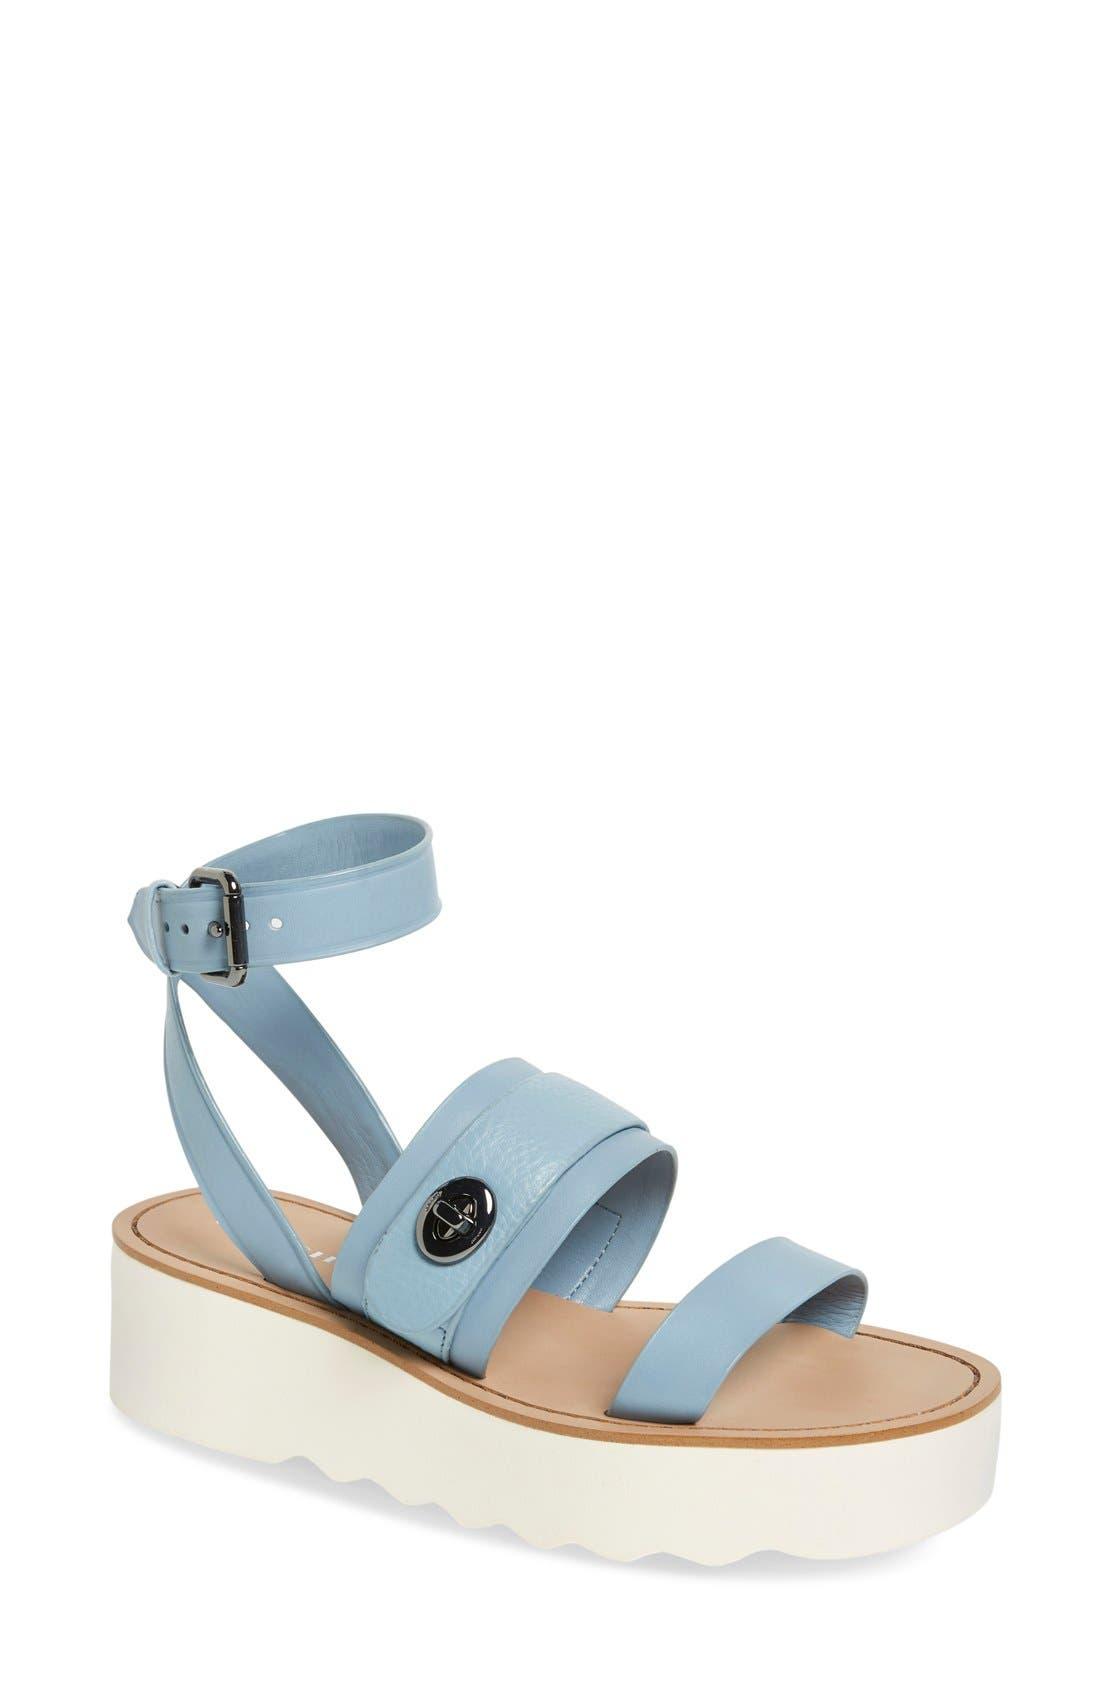 COACH 'Platt' Platform Sandal